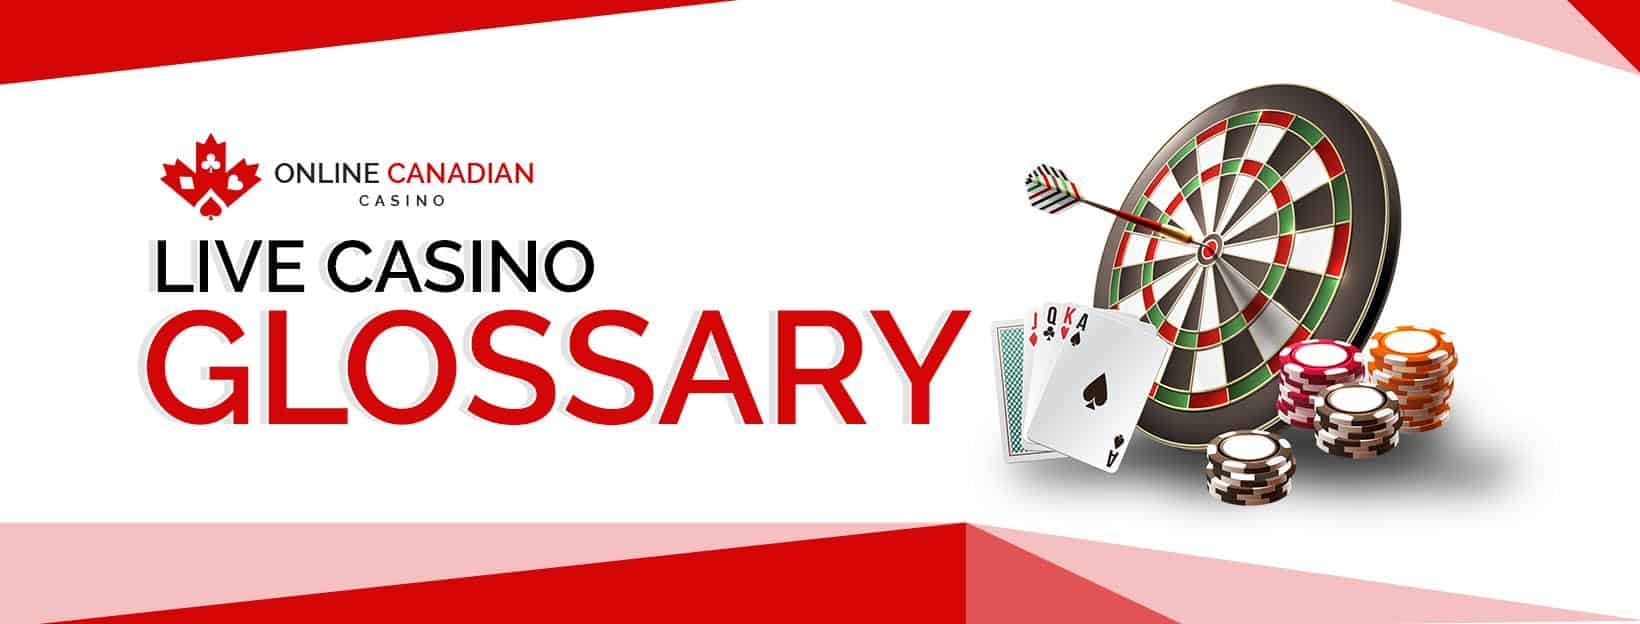 live casino glossary